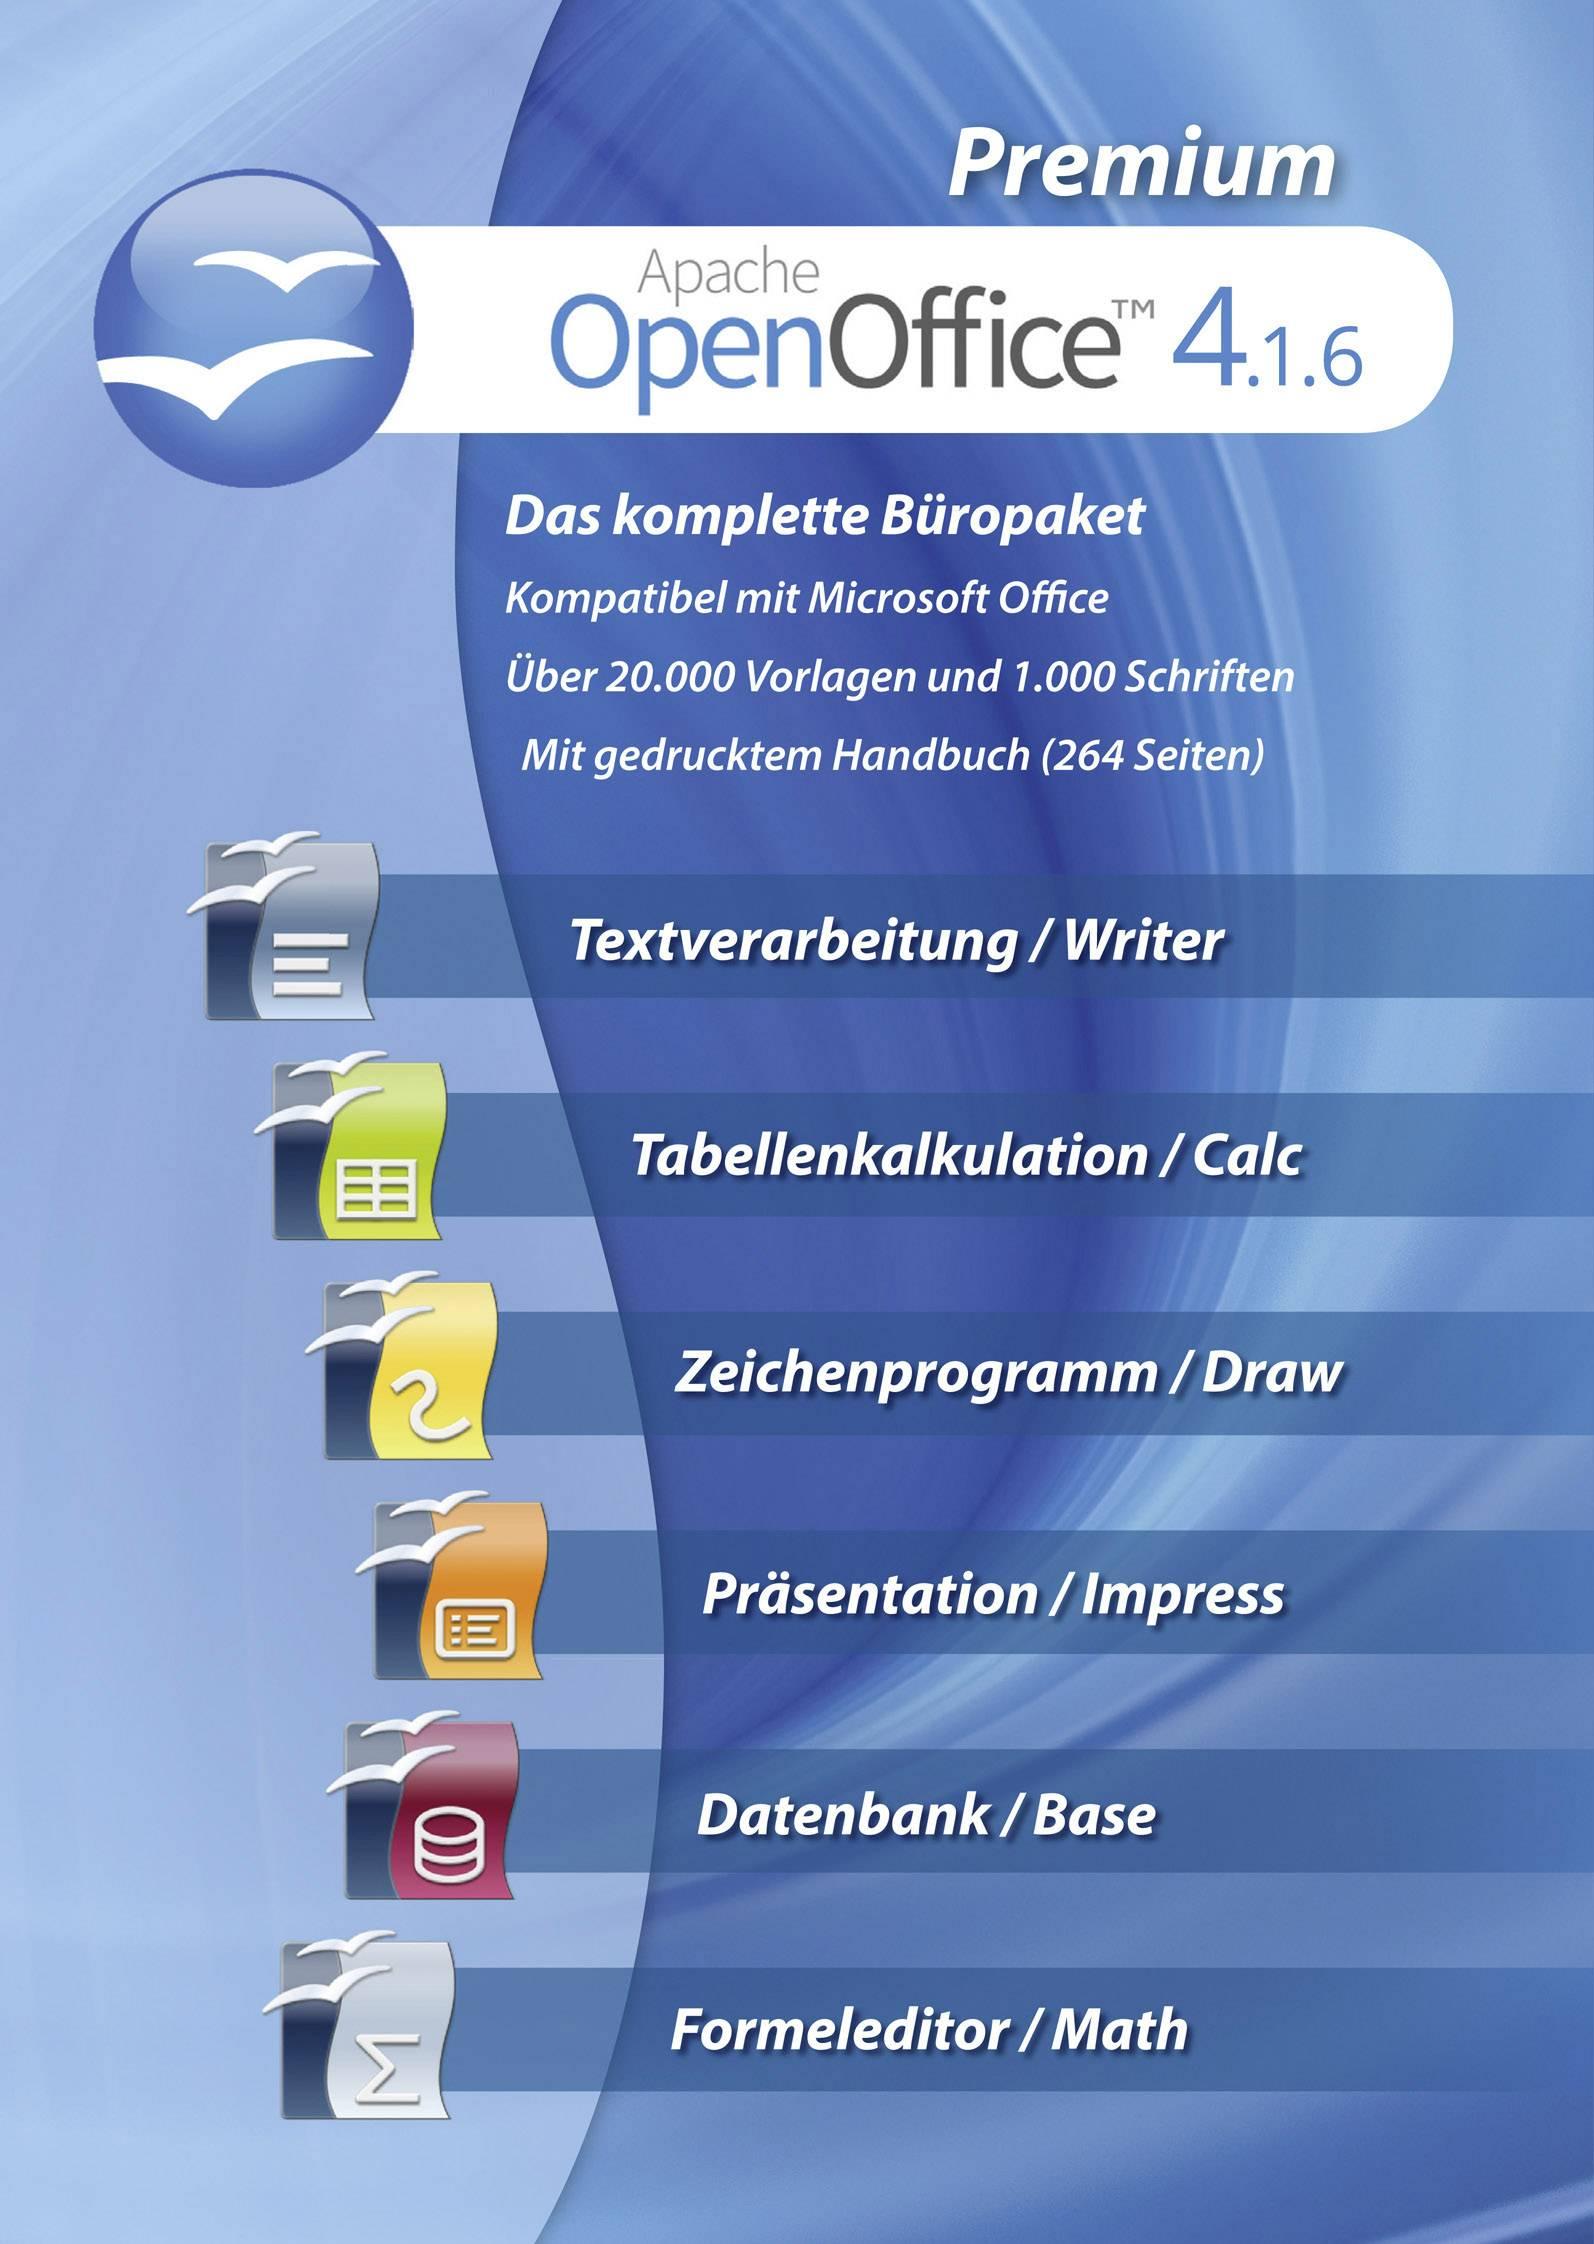 Openoffice 4 1 6 Premium Windows Office Package Conrad Com